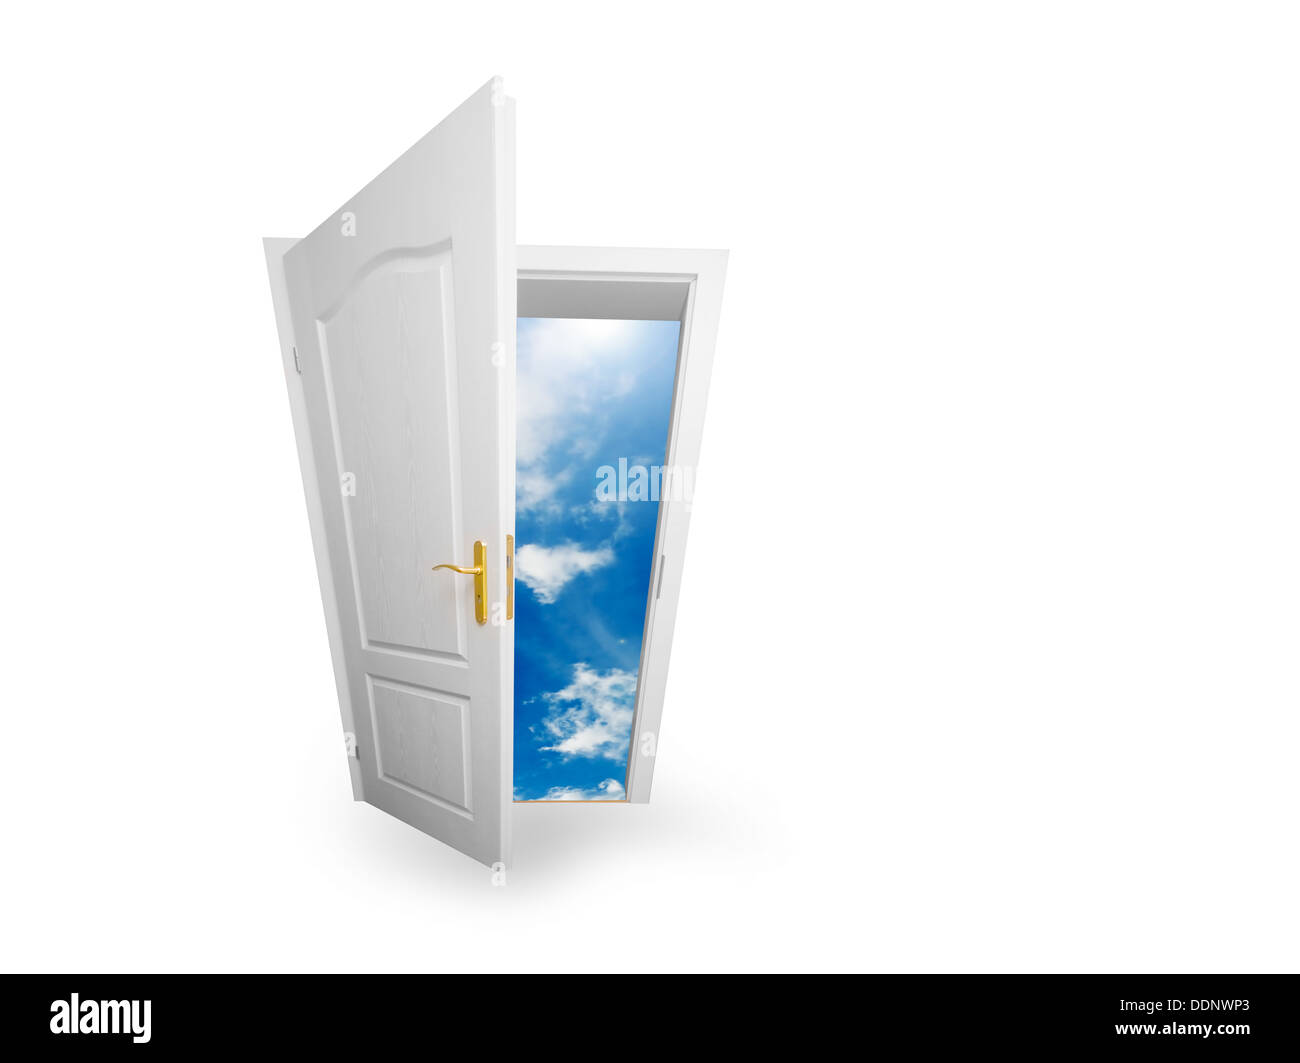 Neue Welt/Zukunft/Träume/Wünsche/Himmel offenes Konzept Stockbild